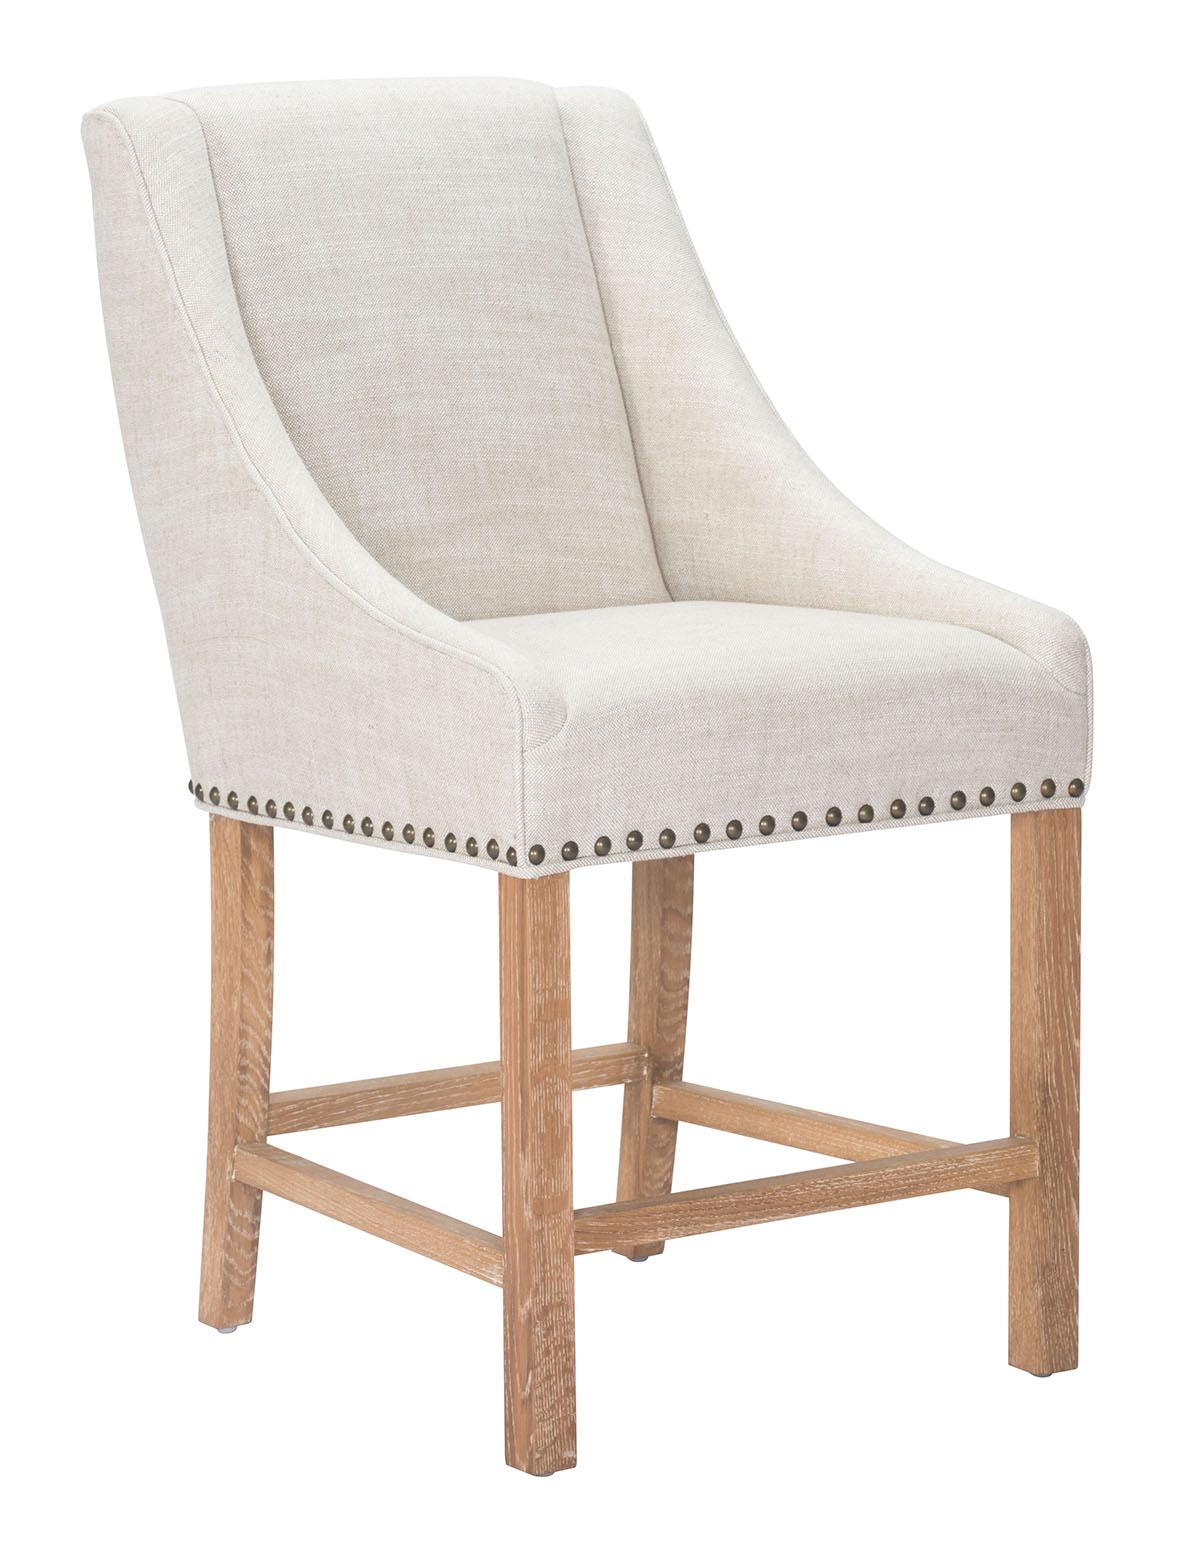 indio-counter-chair-beige.jpg